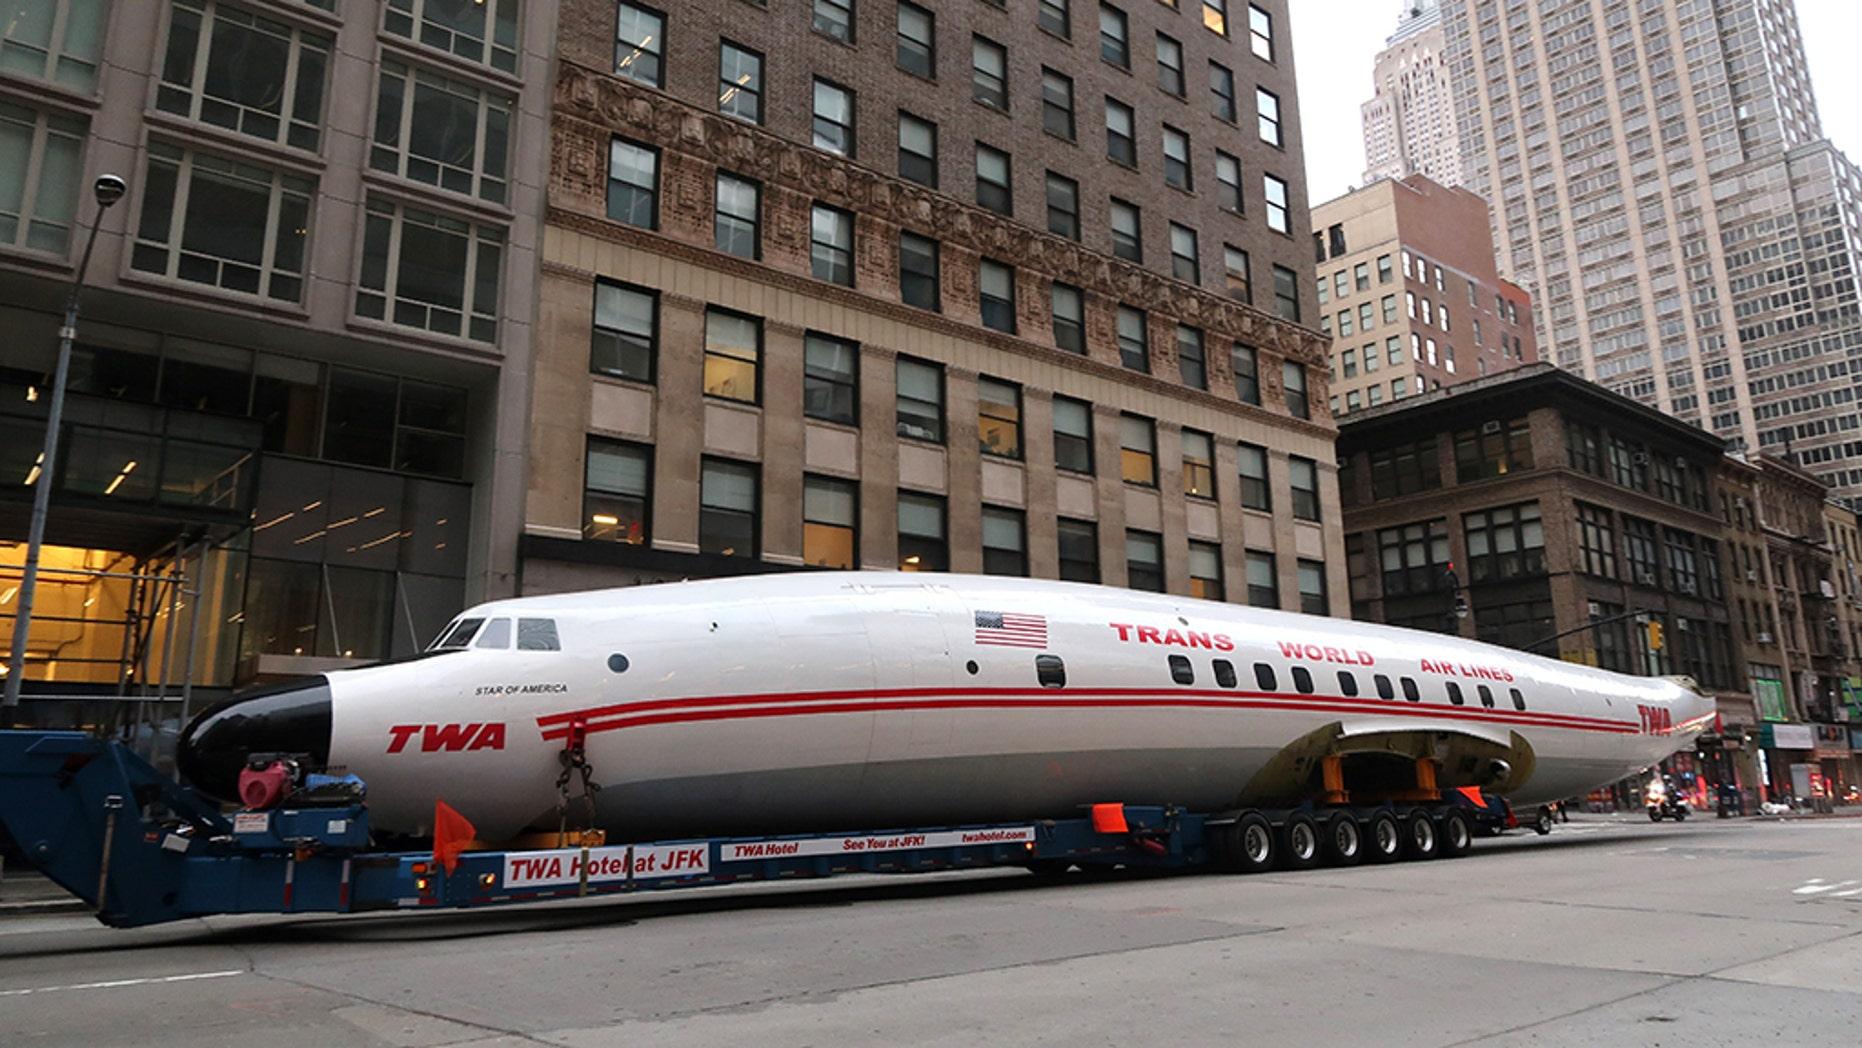 TWA plane driven through NYC before becoming JFK airport hotel bar